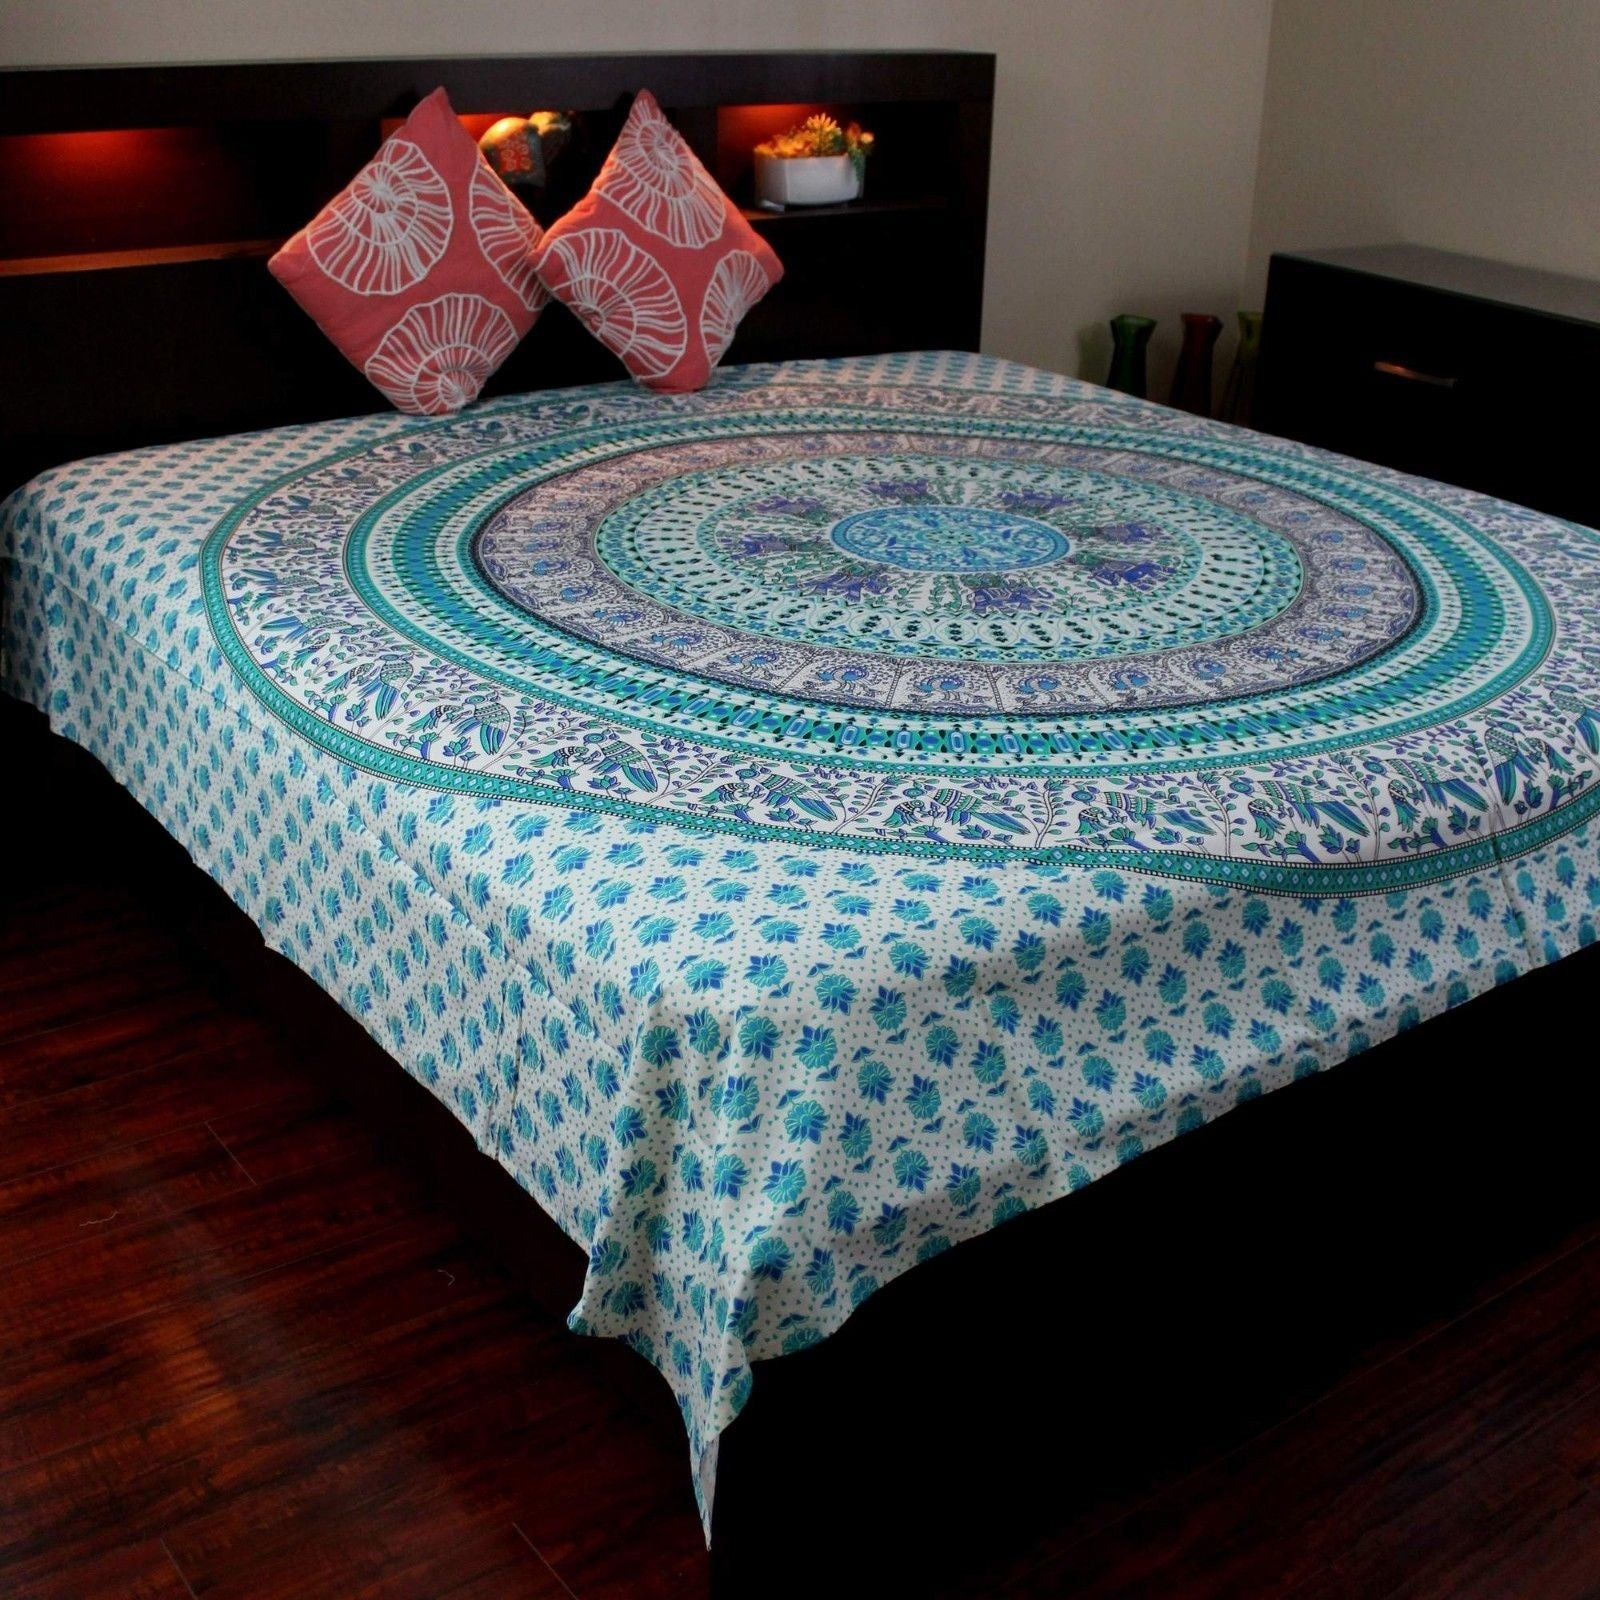 Shop Elephant Mandala Tapestry Wall Hanging 100% Cotton Tablecloth ...